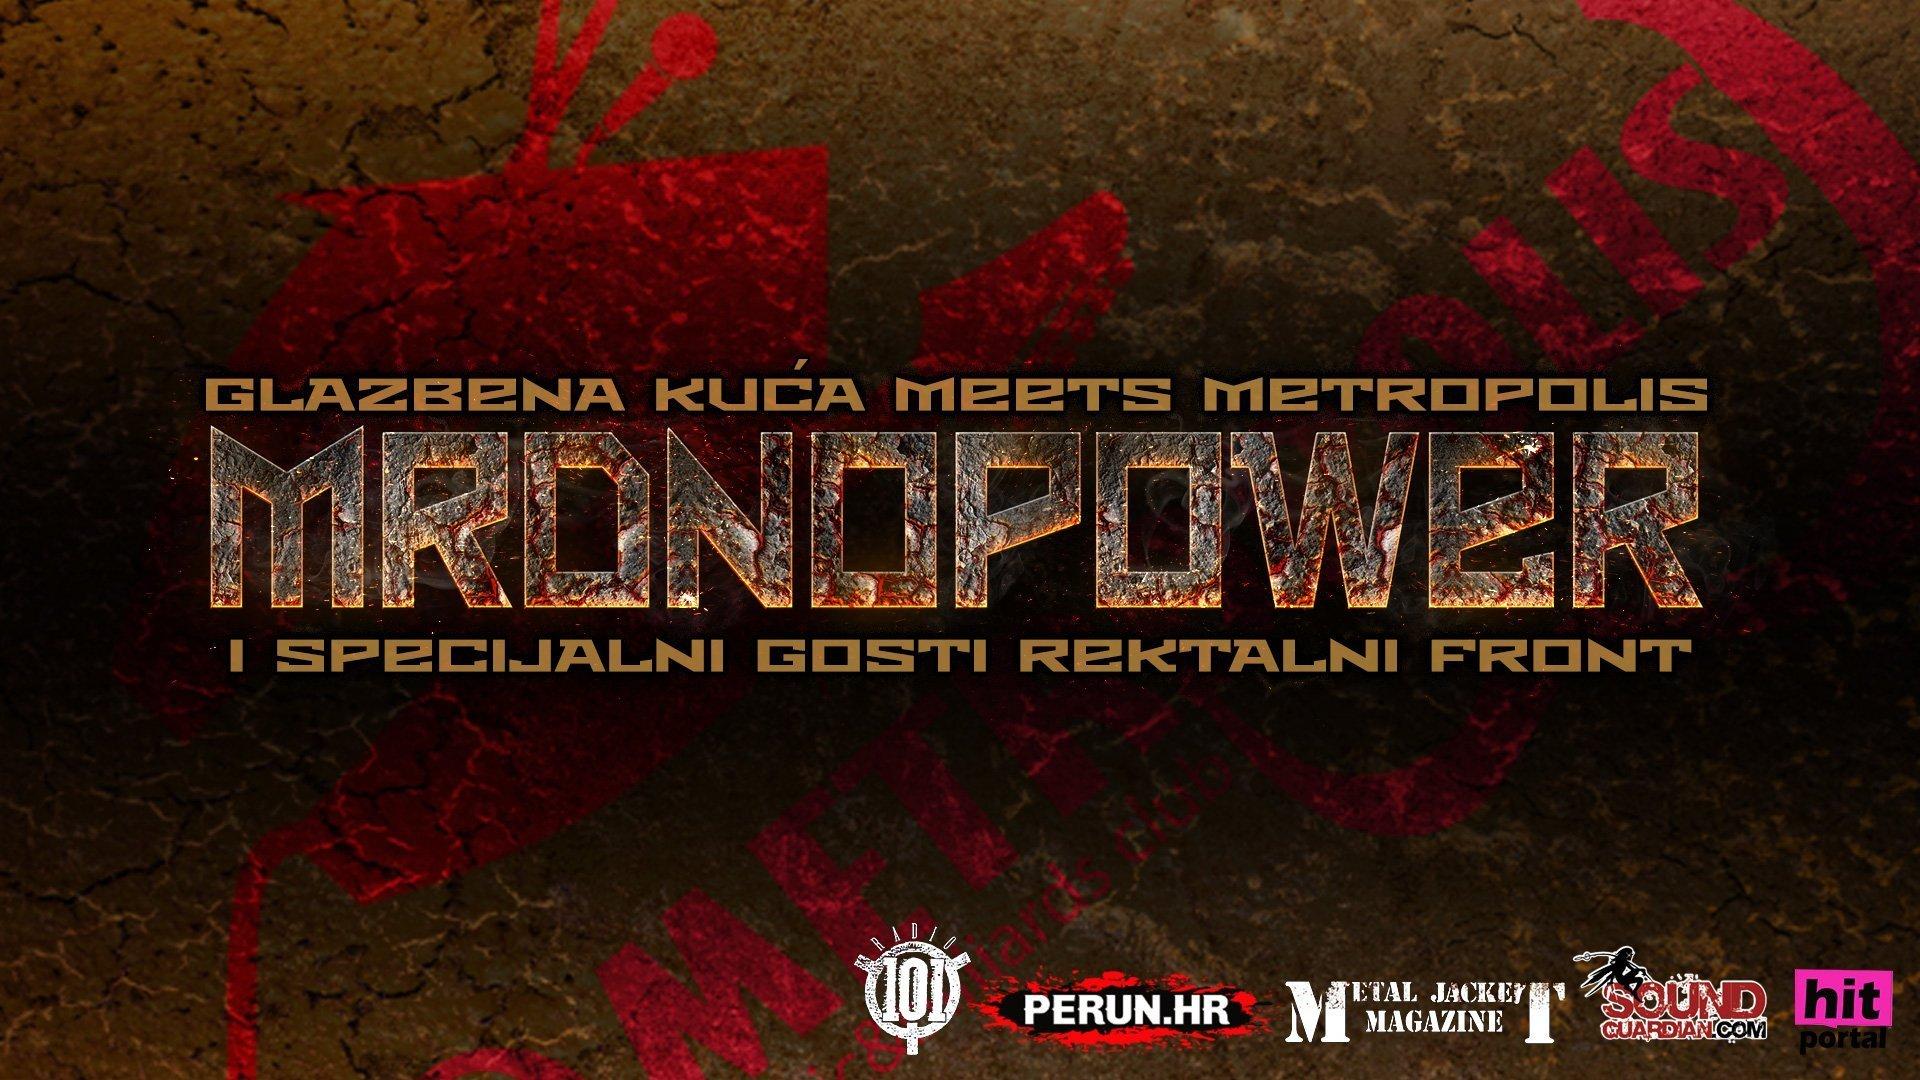 Glazbena Kuća meets Metropolis